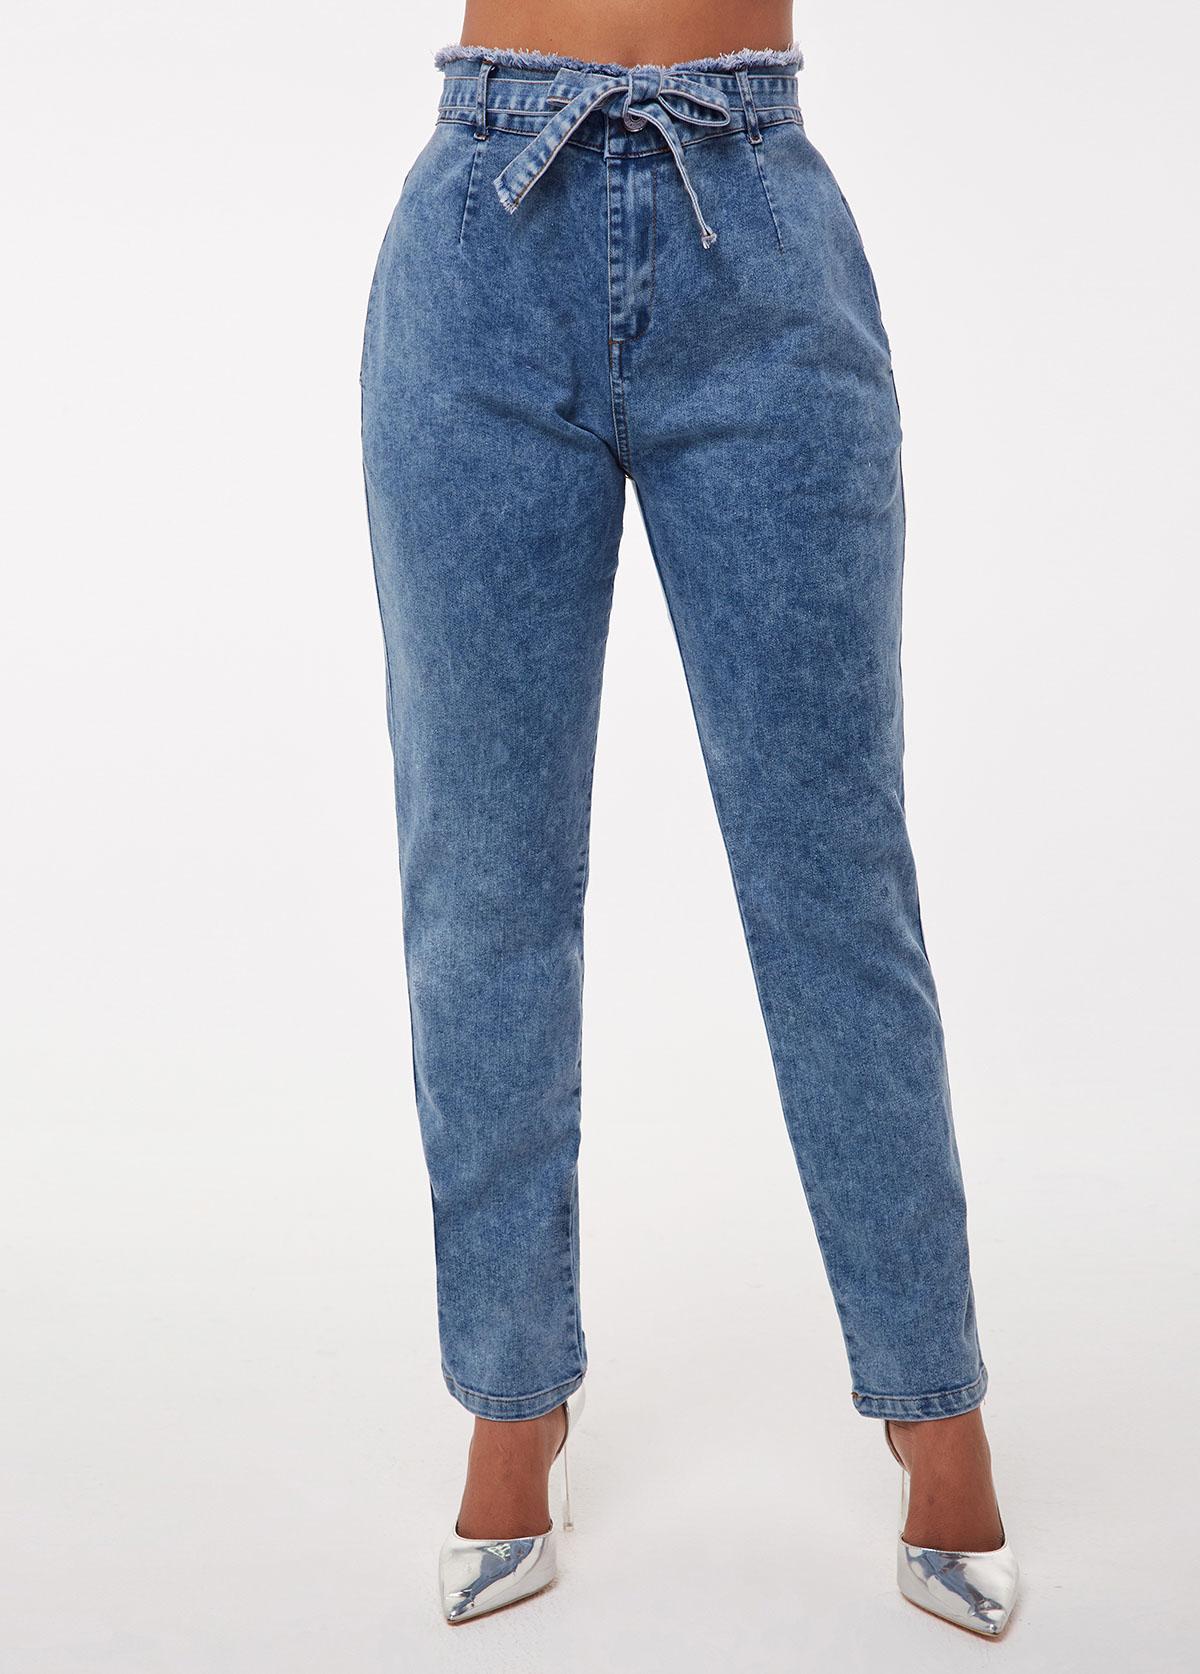 High Waist Frayed Hem Tie Waist Jeans